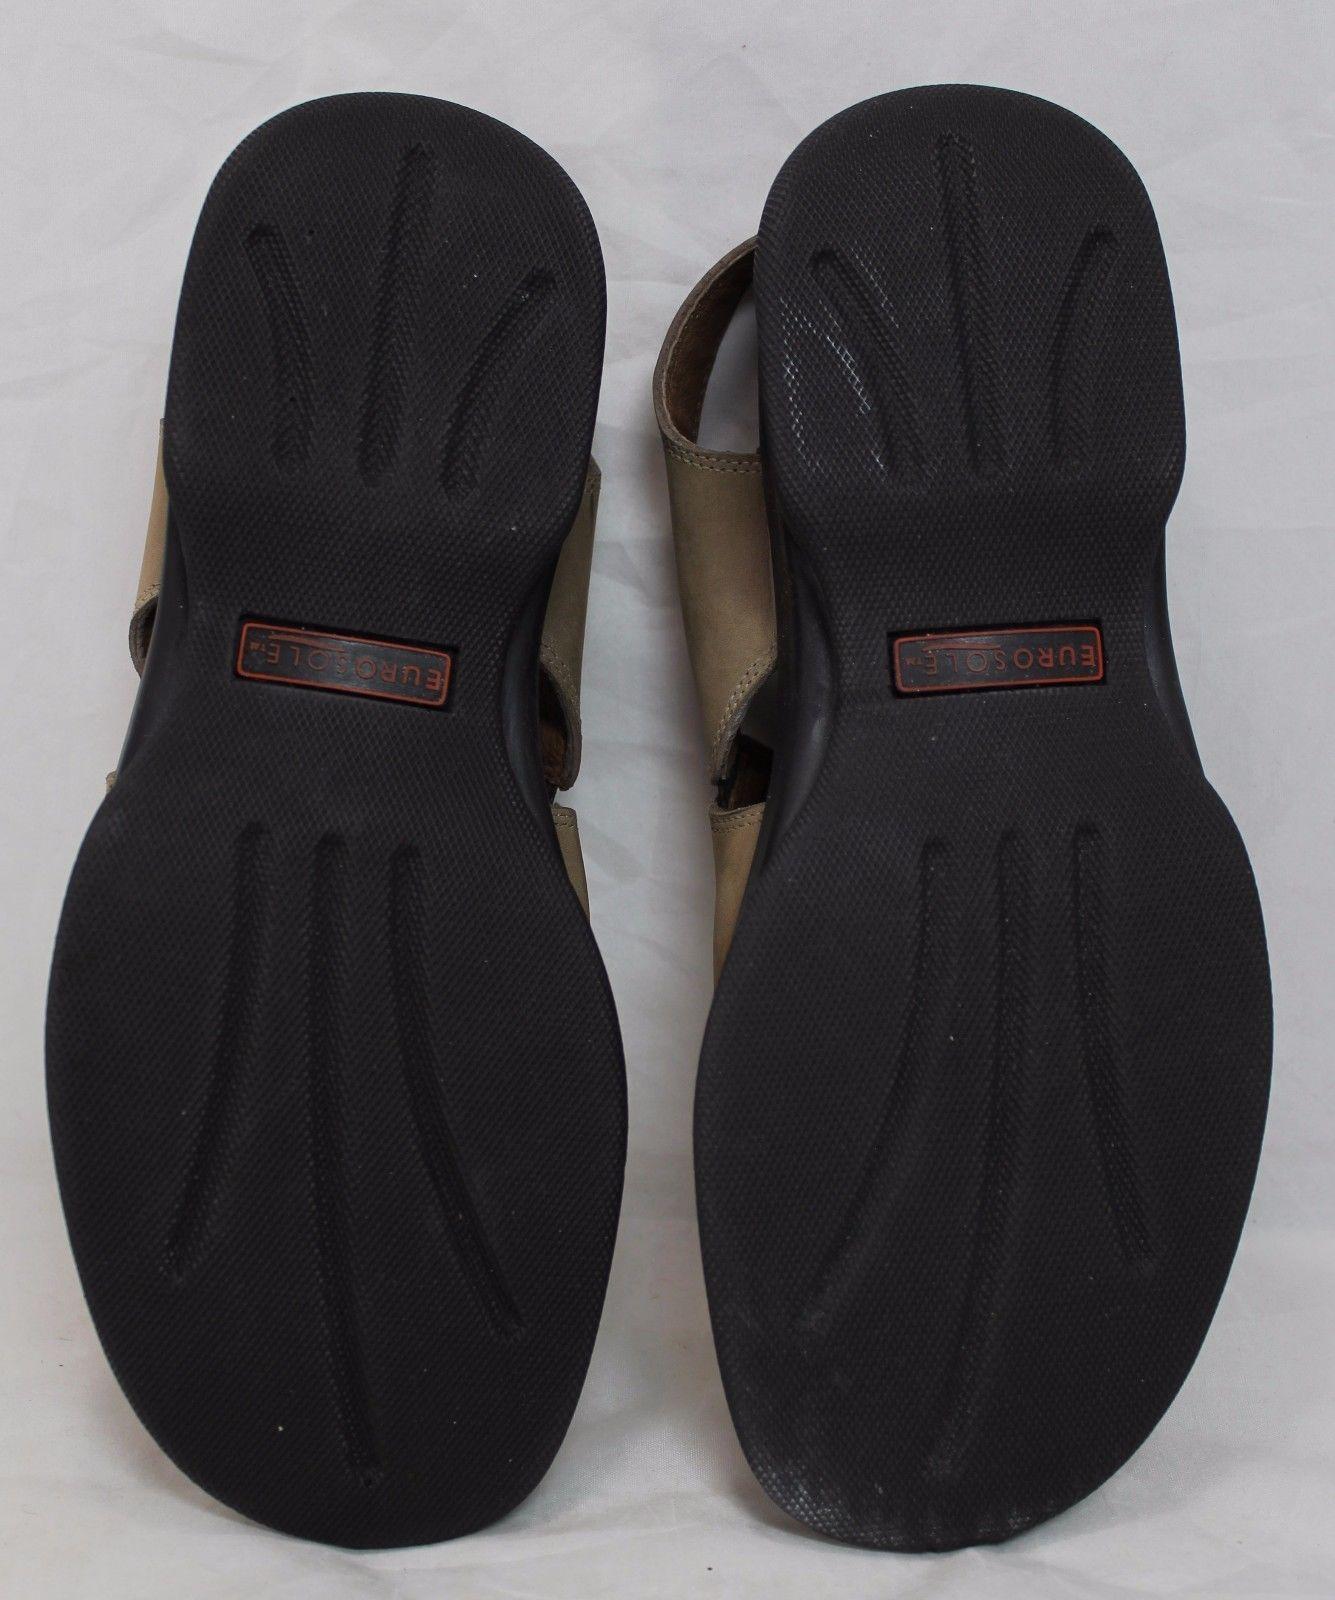 8ead9cab3964 Women s Naturalizer Casual Wedge Sandals Brown Adjustable Back size 8 M EUC